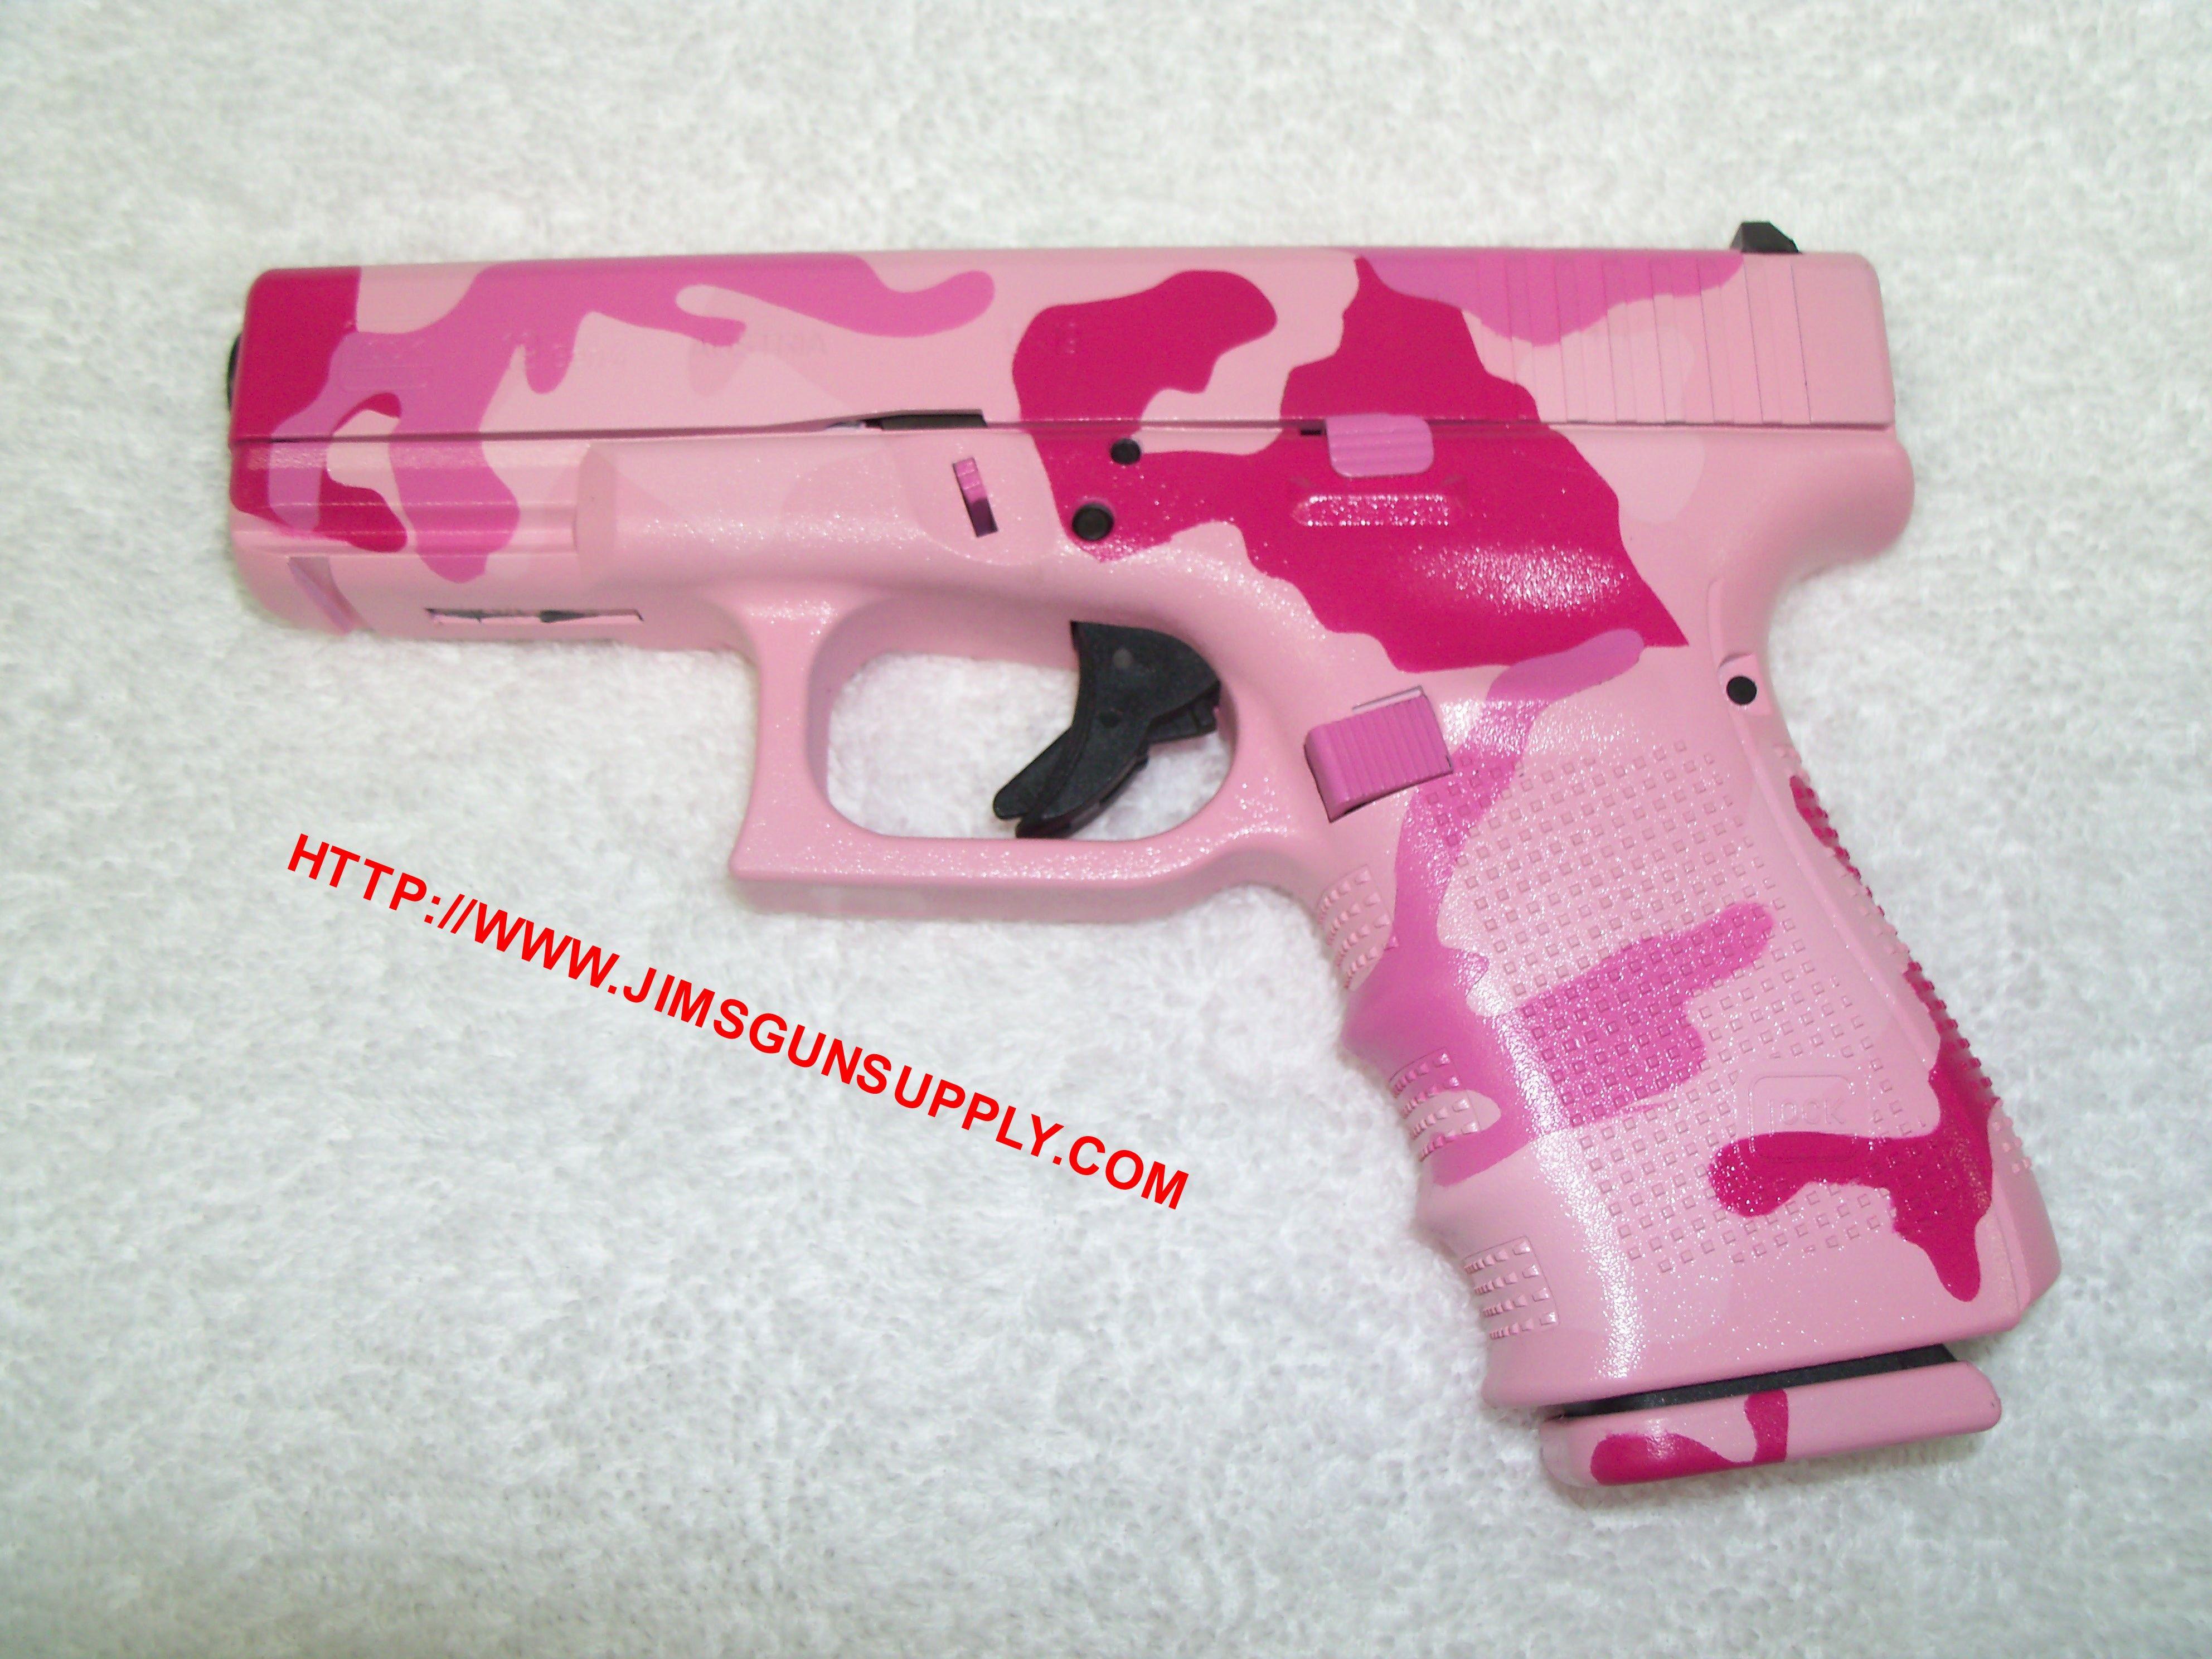 Glock 23 handgun, customized in pink camo Duracoat finish by Jim\'s ...